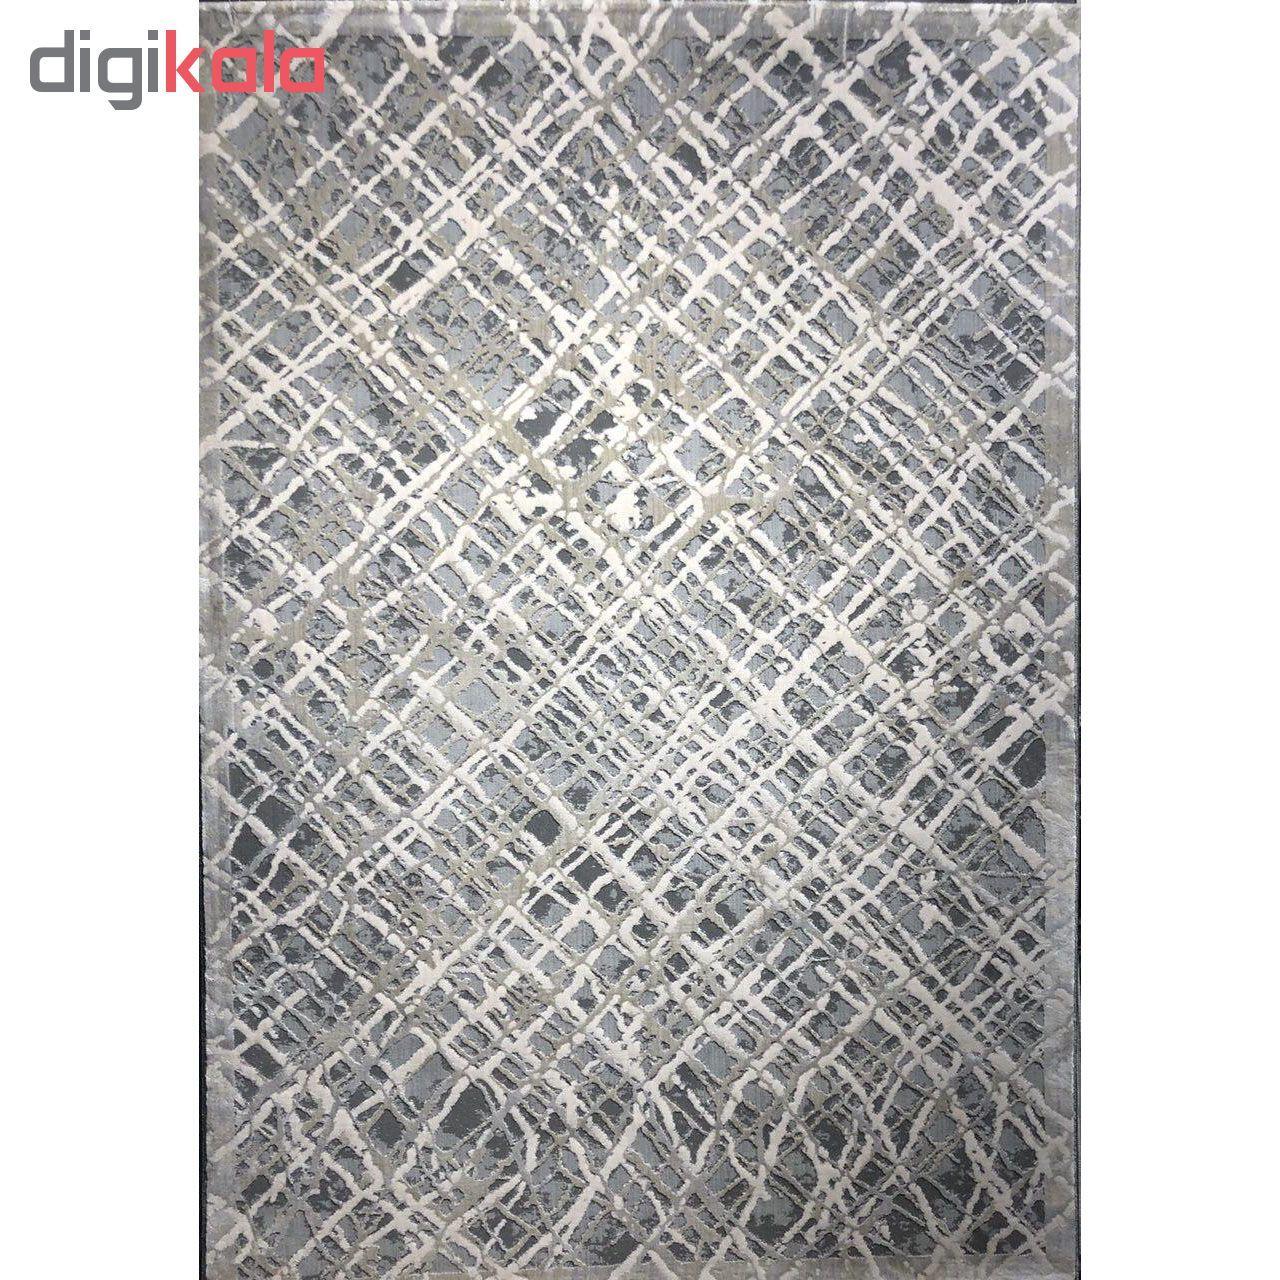 فرش ماشینی طرح پلاتینیوم کد 5002 زمینه طوسی  main 1 1